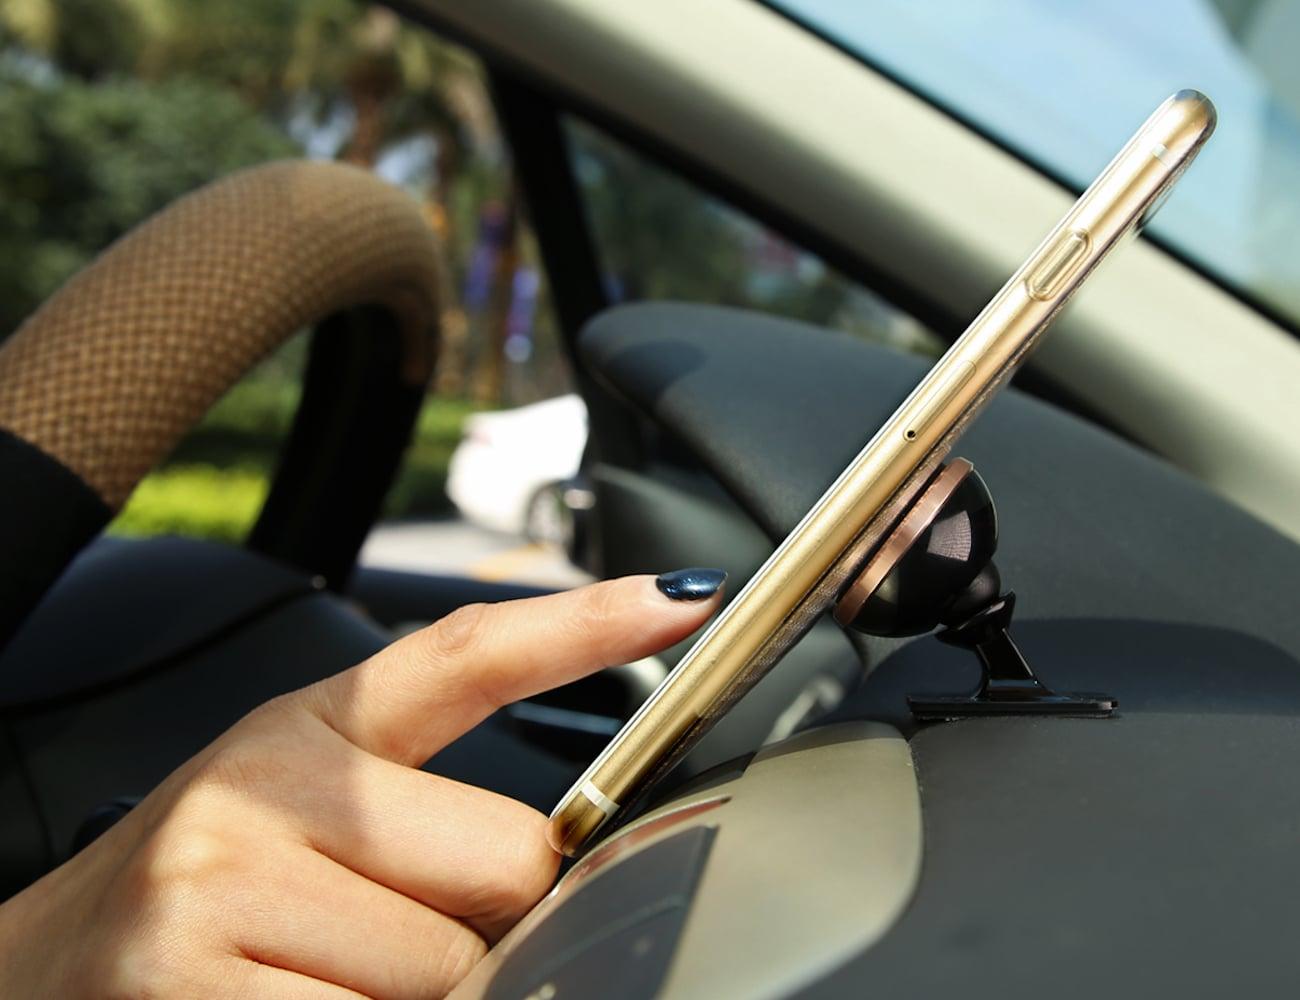 Baseus 360-Degree Magnetic Car Phone Holder